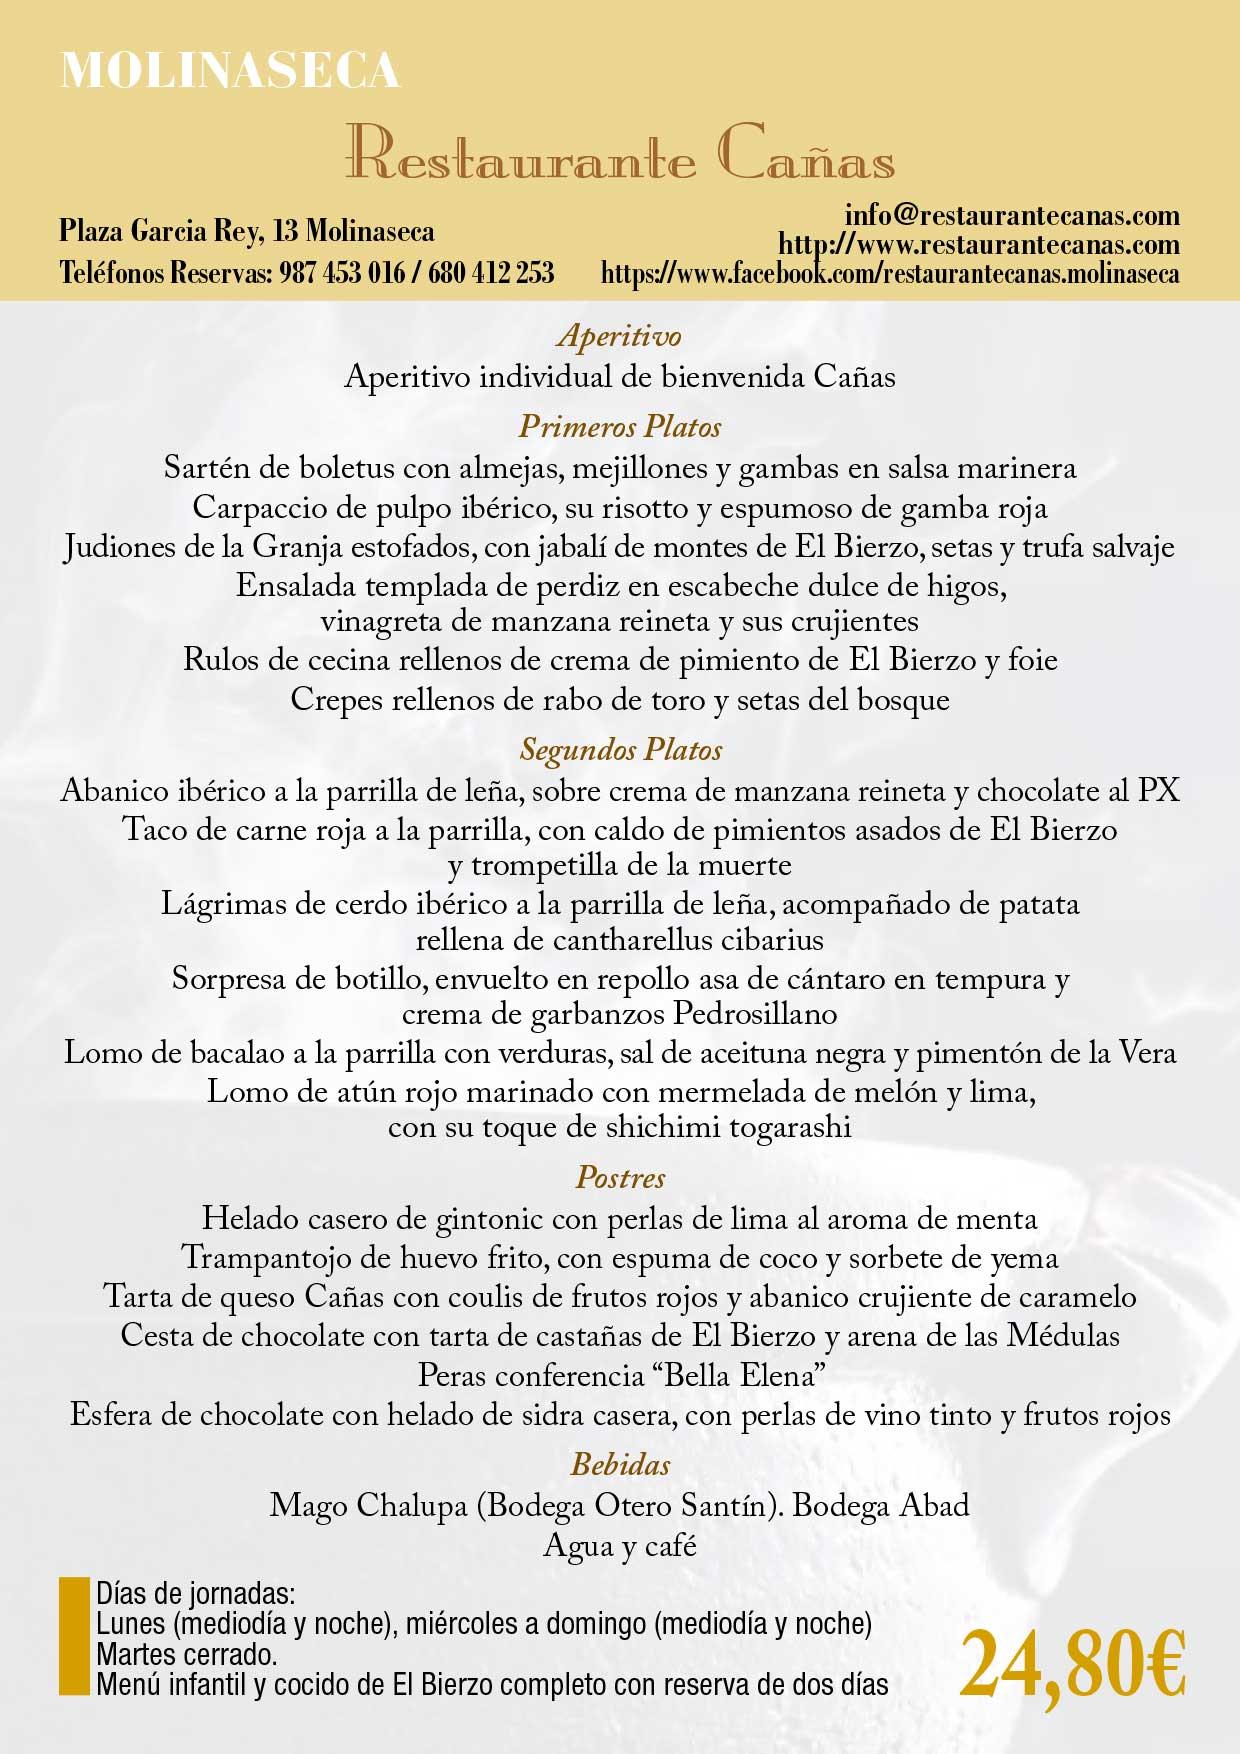 XXXIII Jornadas gastronómicas del Bierzo 2017. Restaurantes participantes 43